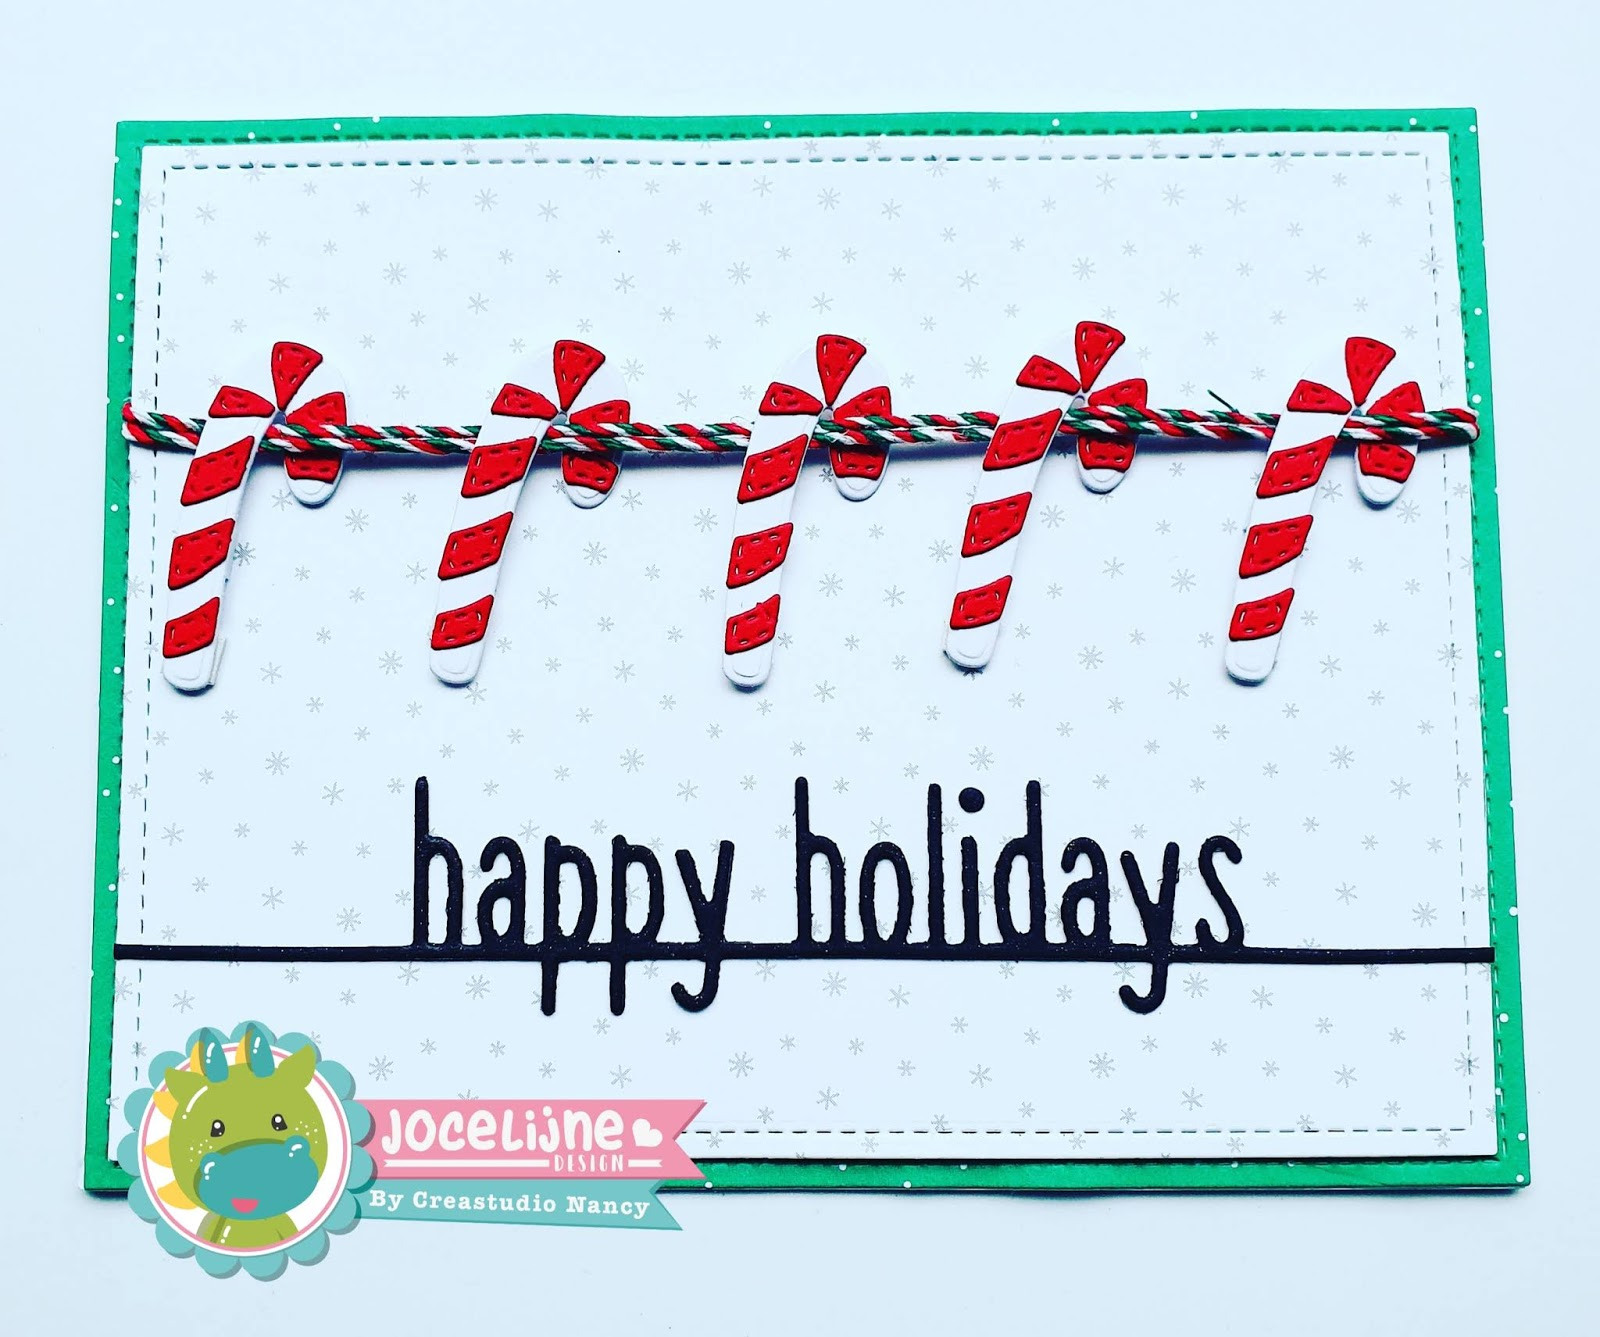 Jingle ornaments candycane 6002/1330